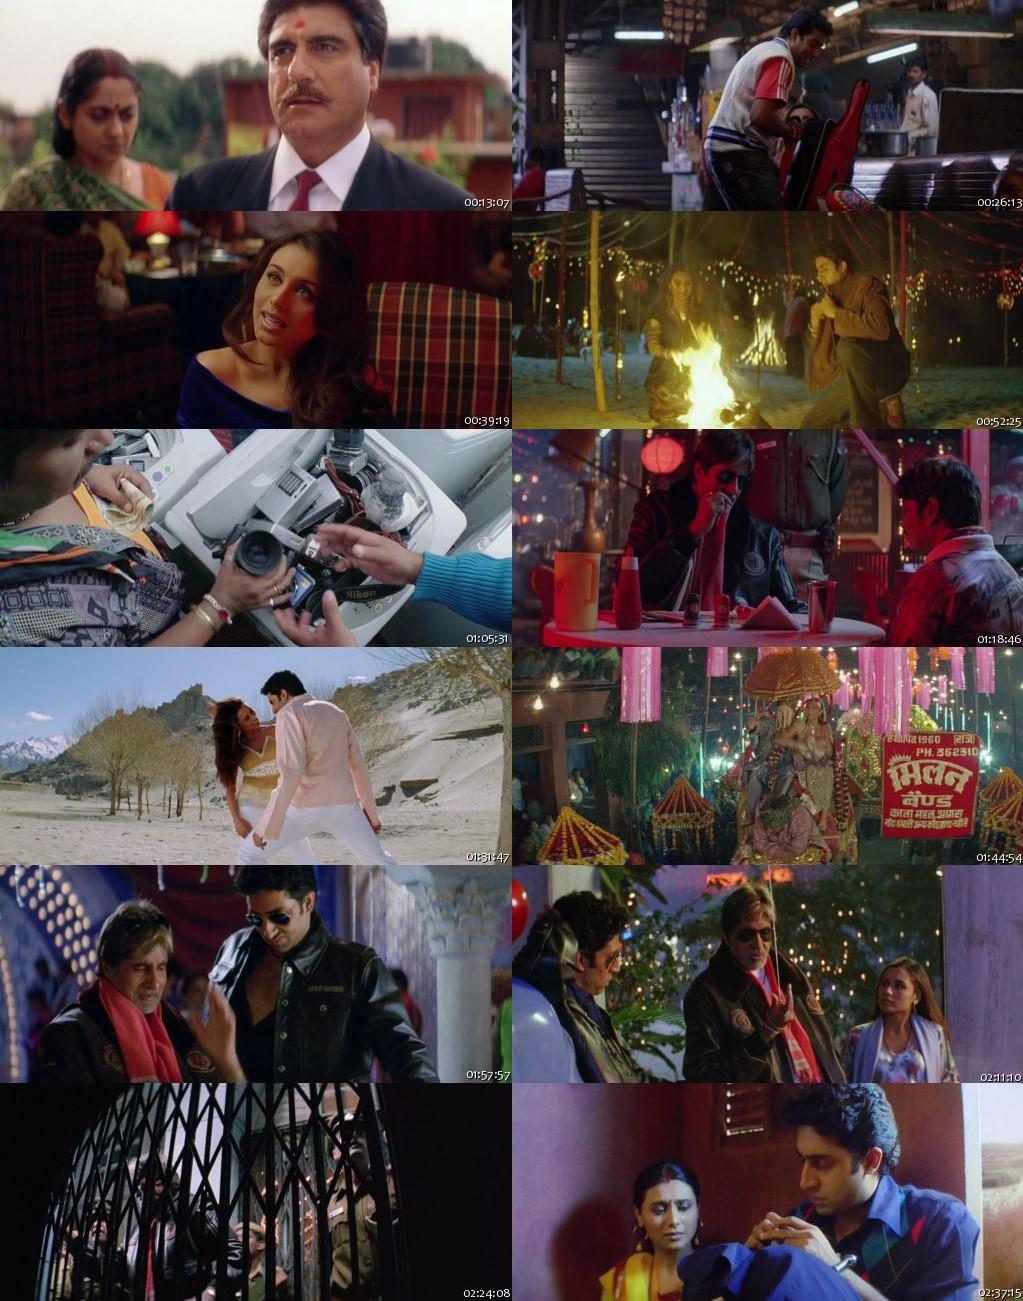 Bunty Aur Babli 2005 Full Hindi Movie Online Watch HDRip 720p